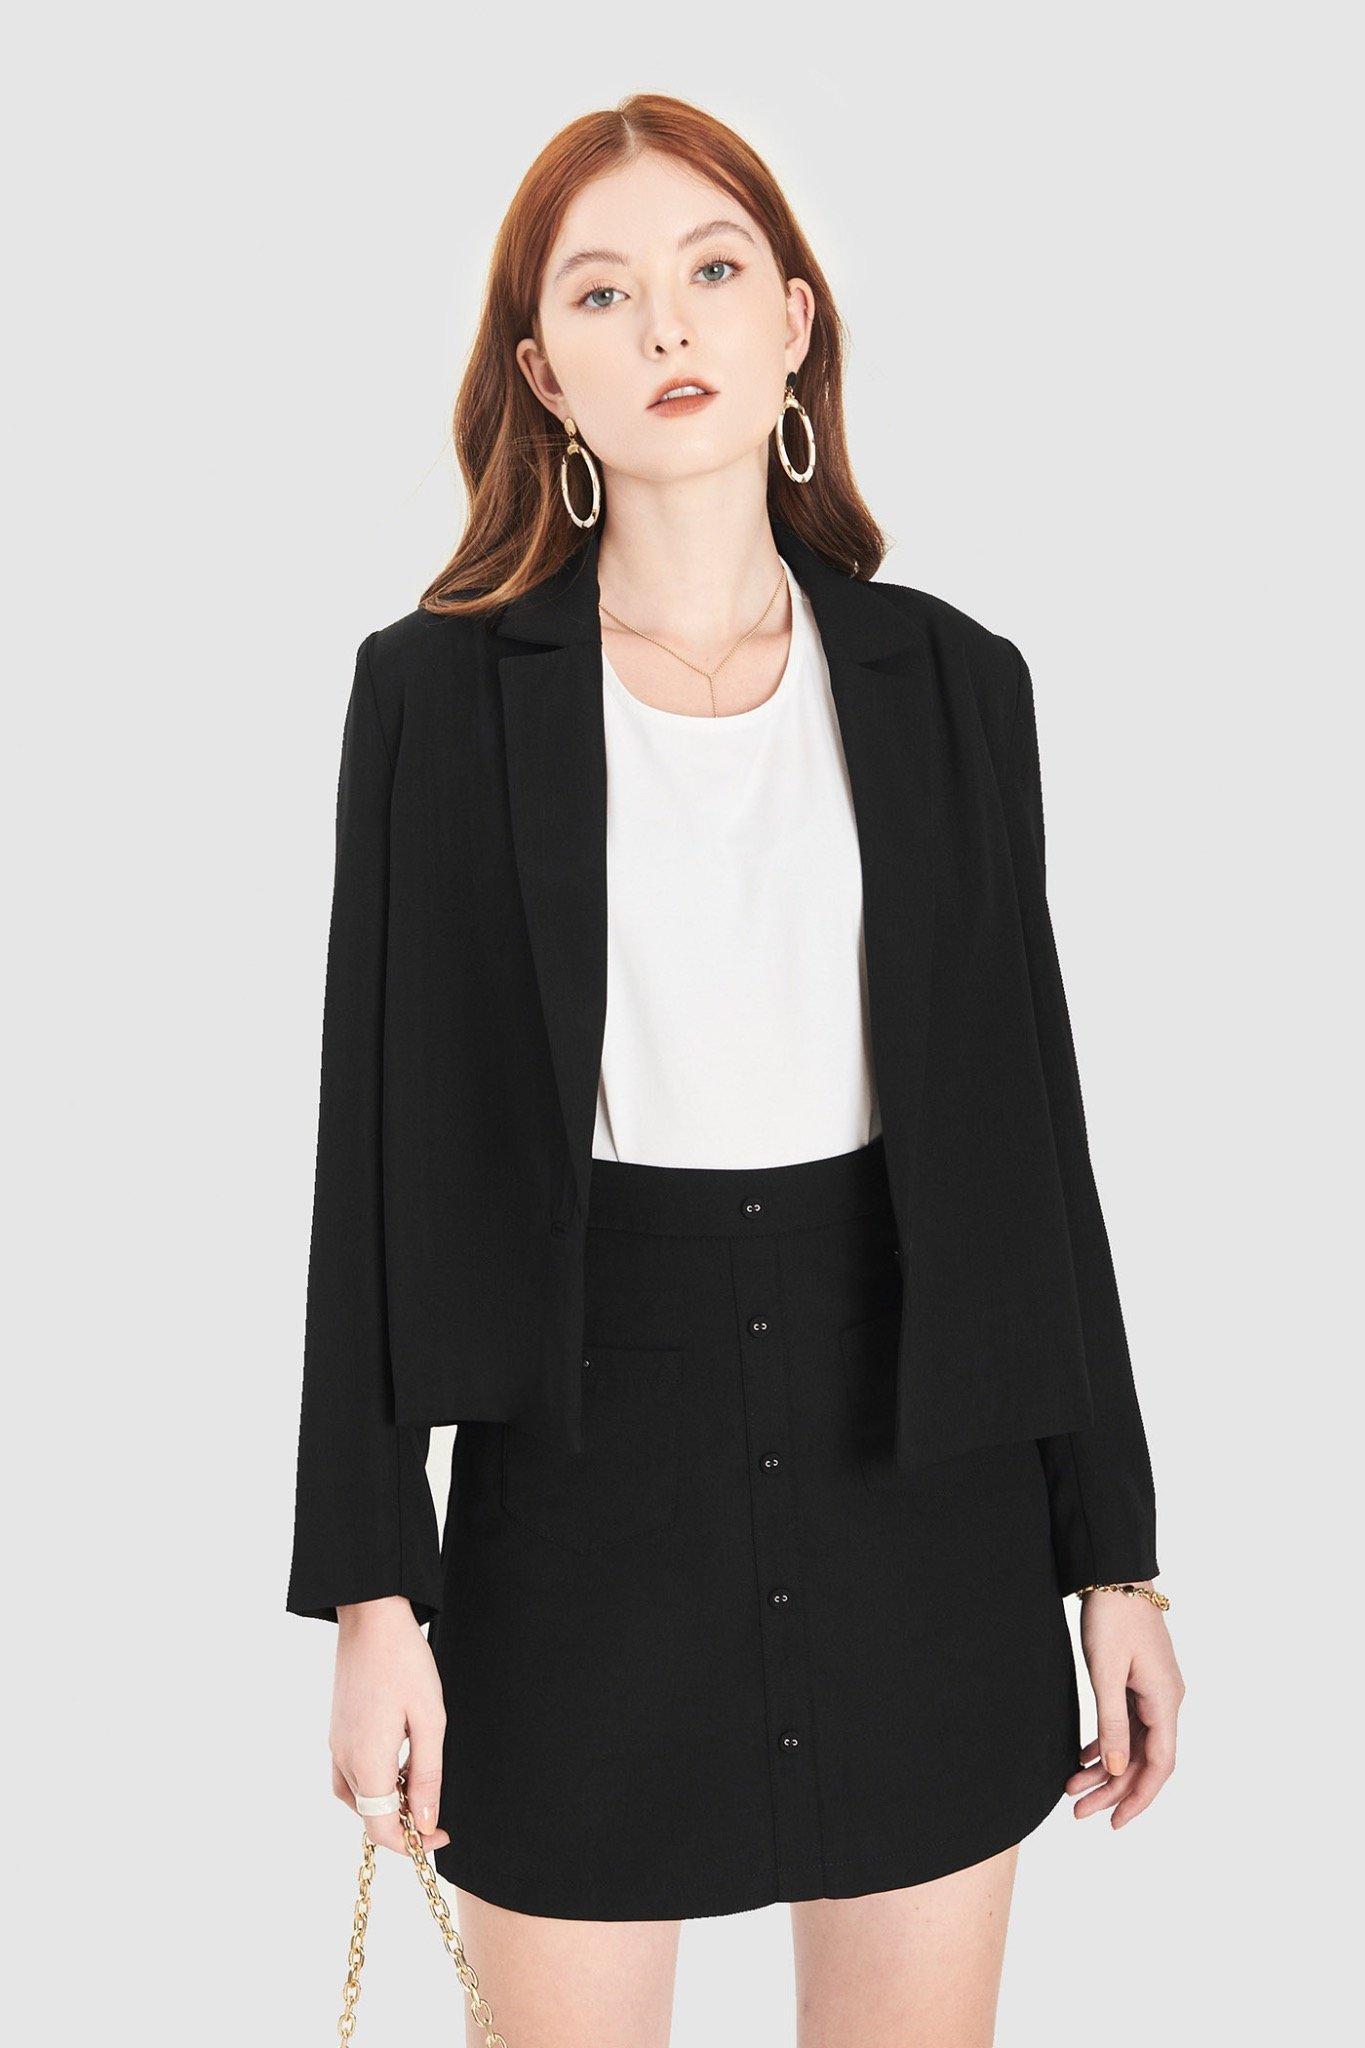 Áo blazer crop cài 1 nút